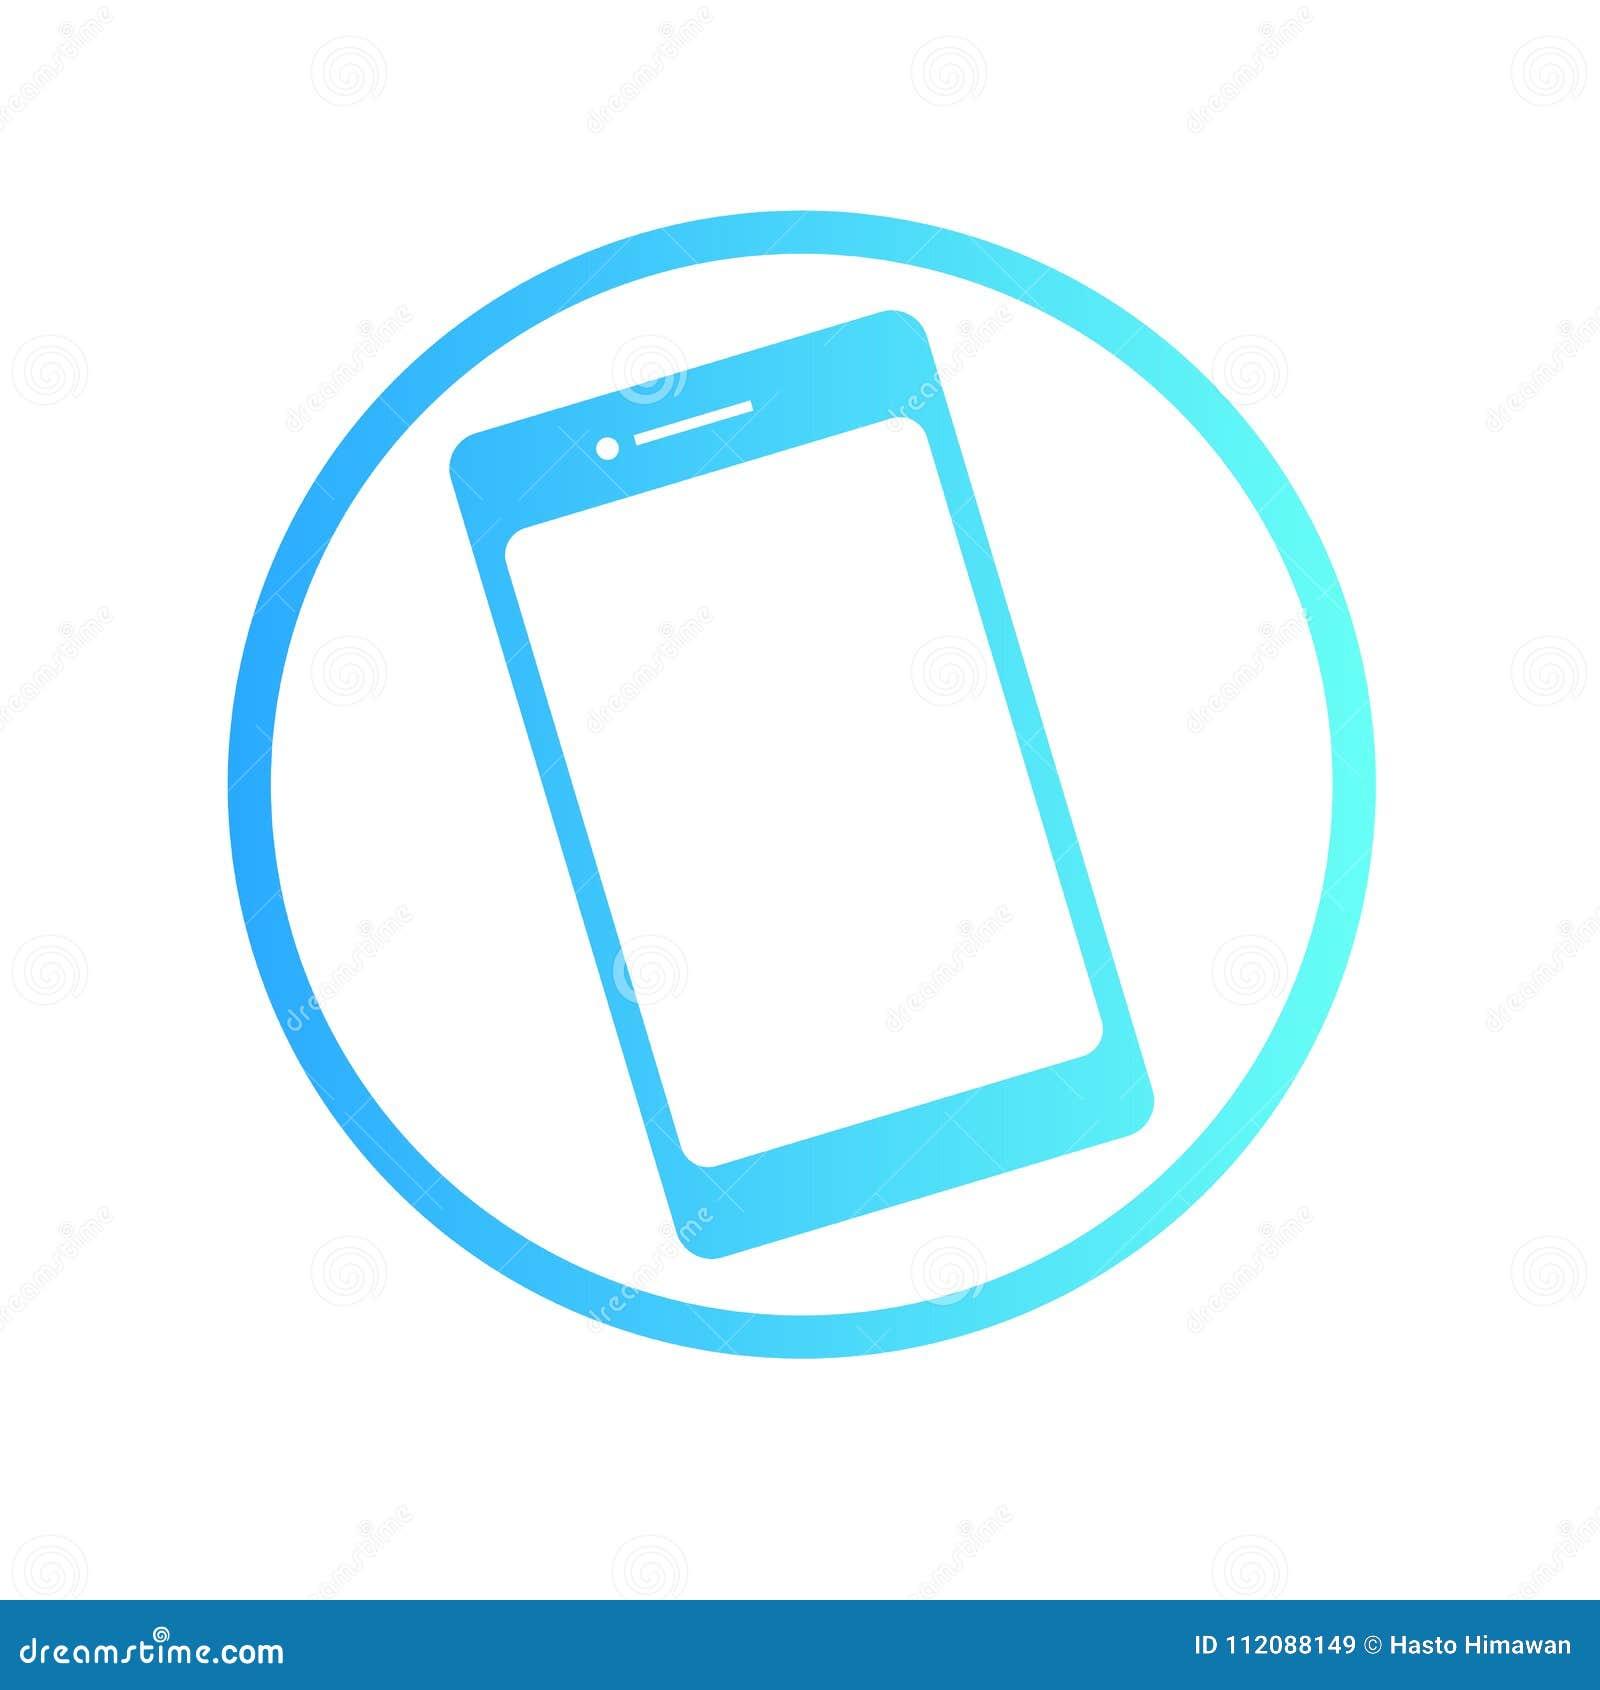 Handphone Logo Stock Vector Illustration Of Icon Object 112088149